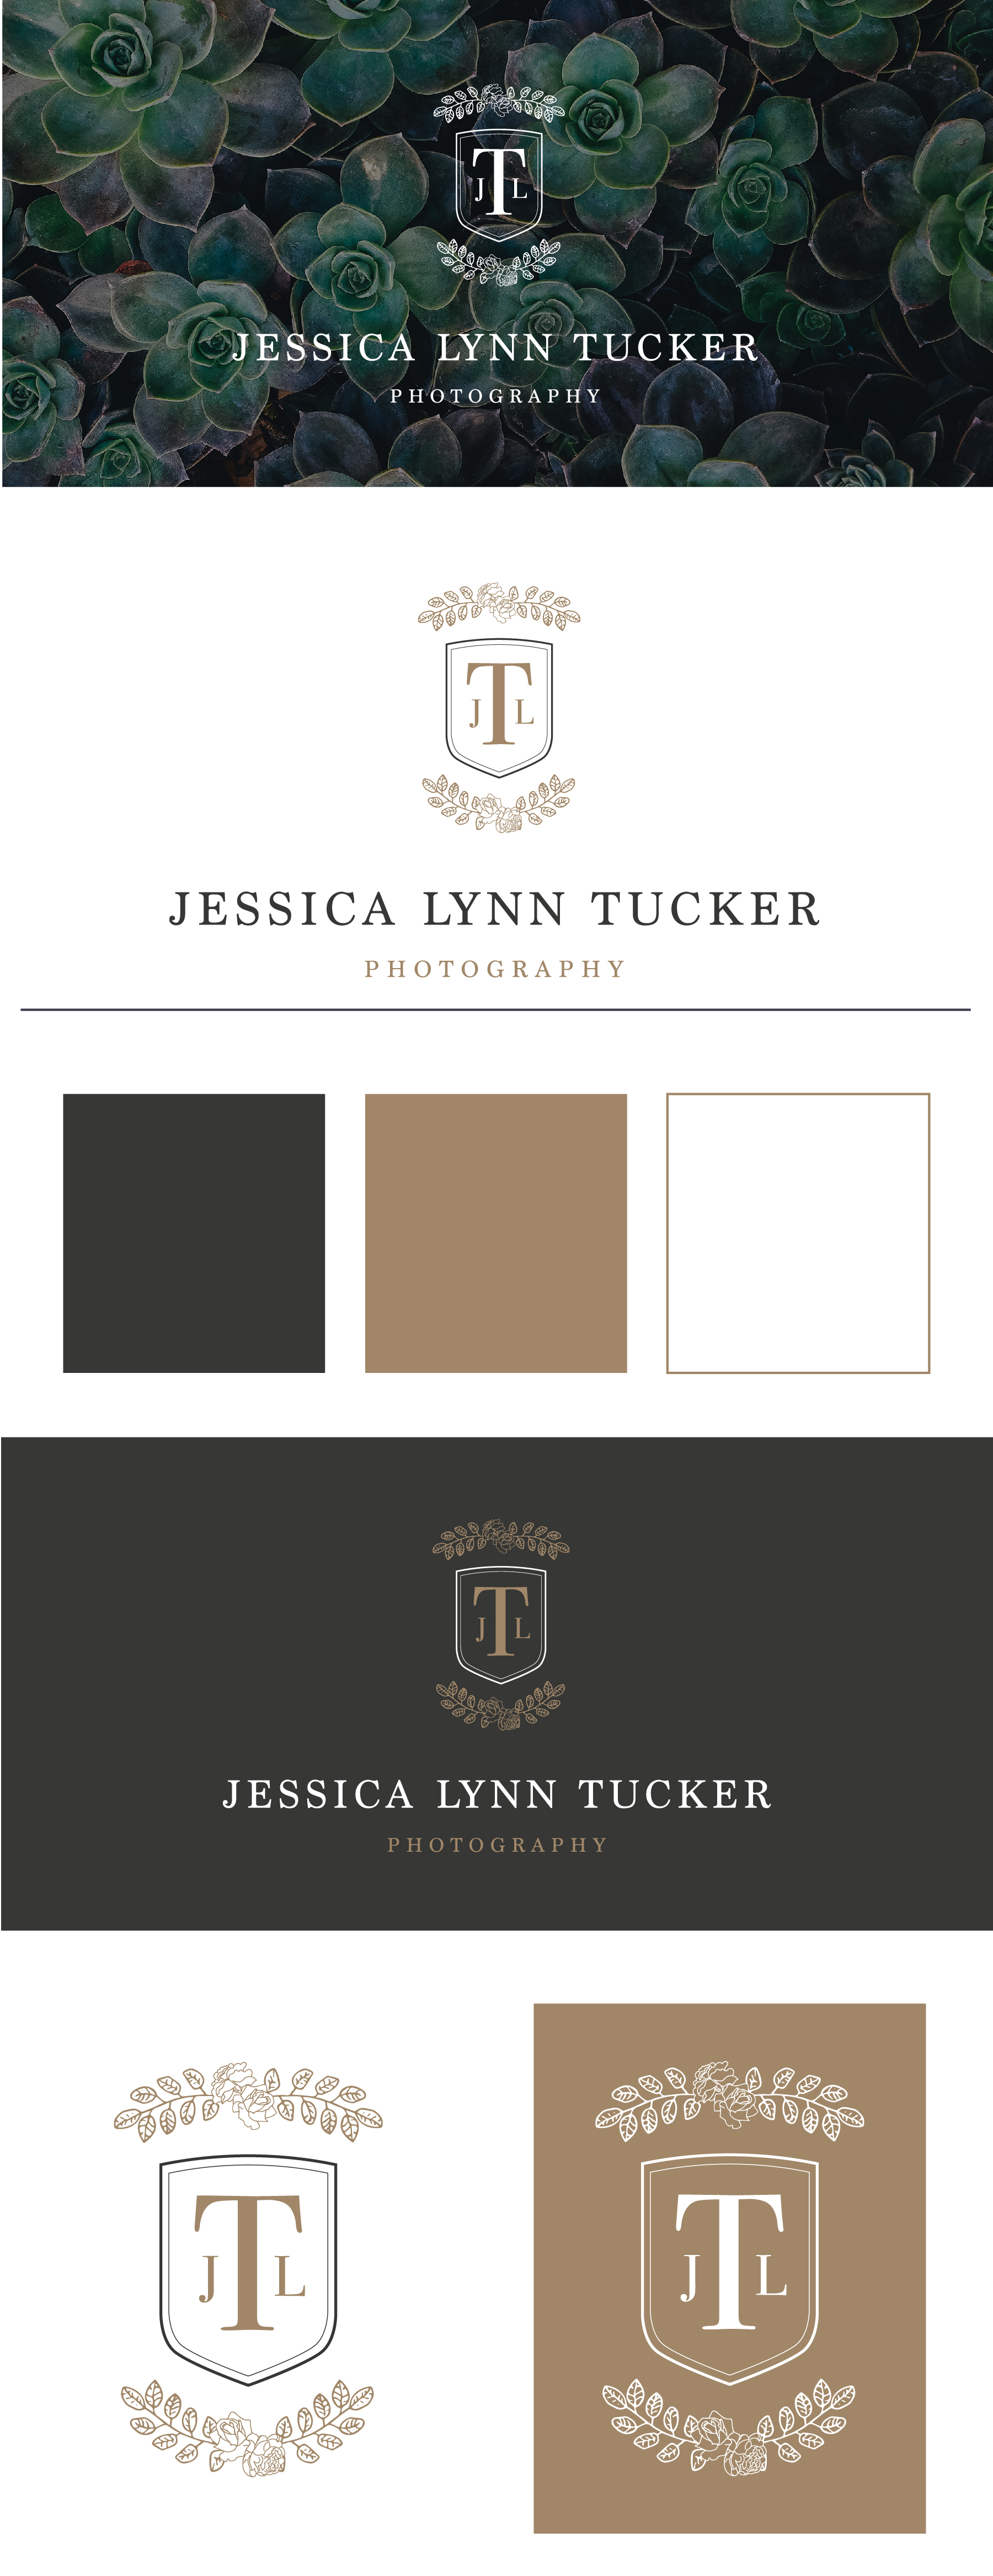 Jessica Lynn Tucker Photography – timeless wedding photographer – Hayley Bigham Designs – Tulsa Oklahoma Branding Studio – floral badge logo